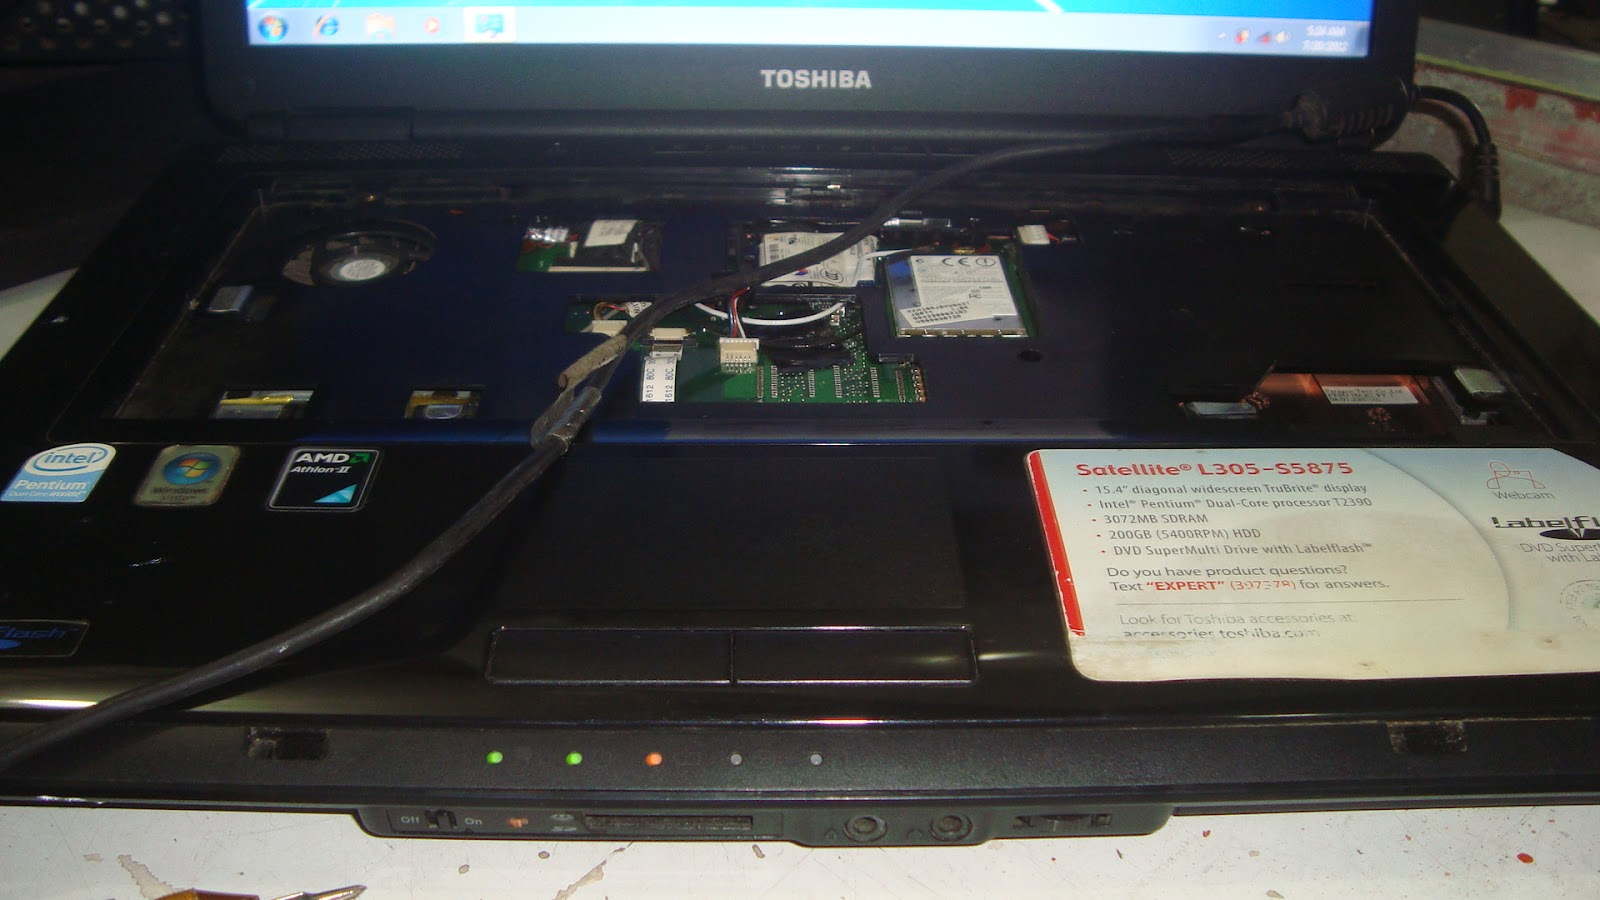 wangpeng New For Toshiba Satellite L305-S5876 L305-S5877 L305-S5894 US Black keyboard